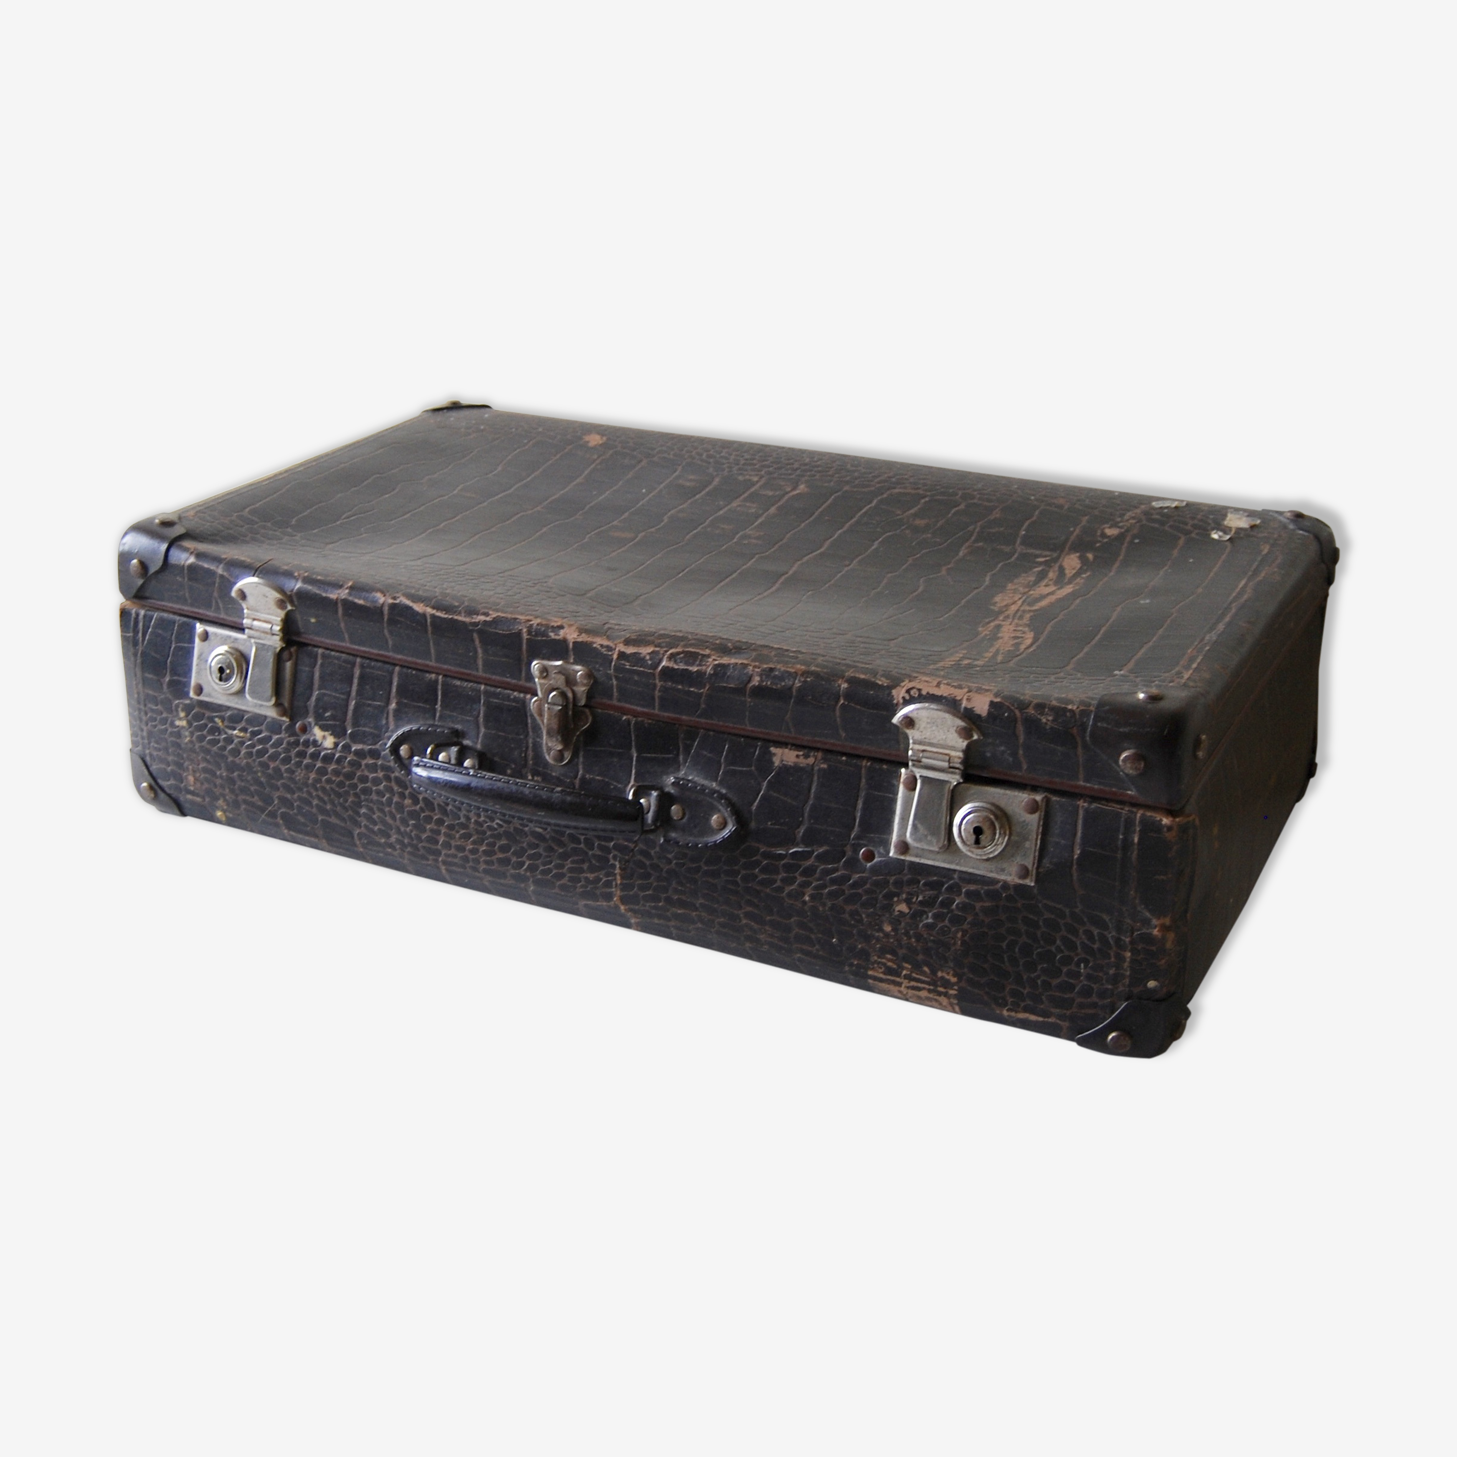 Valise vintage croco marron